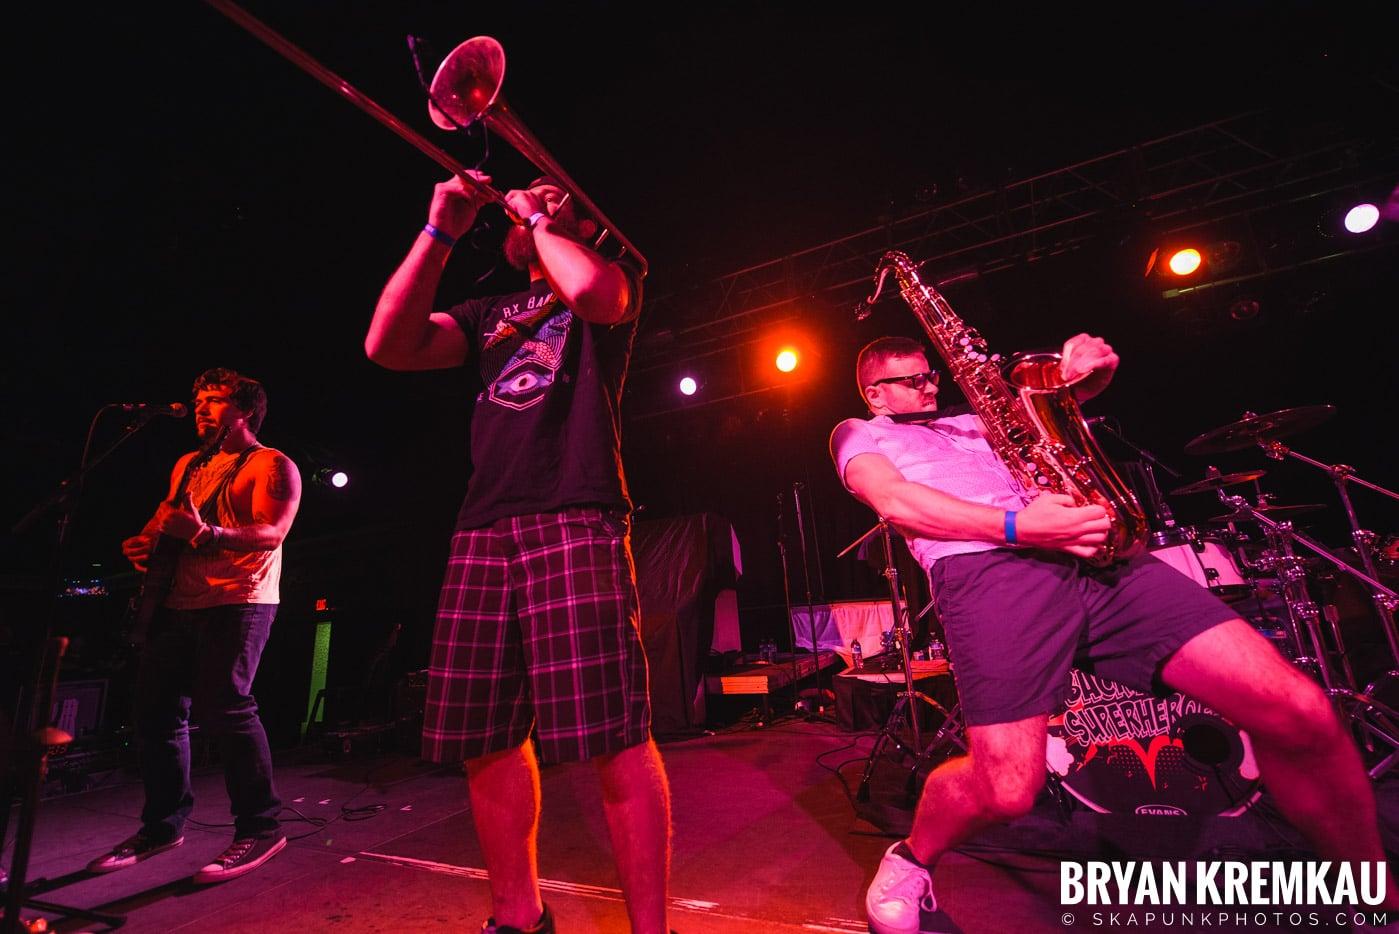 Backyard Superheroes @ Starland Ballroom, Sayreville, NJ - 7.29.17 (19)